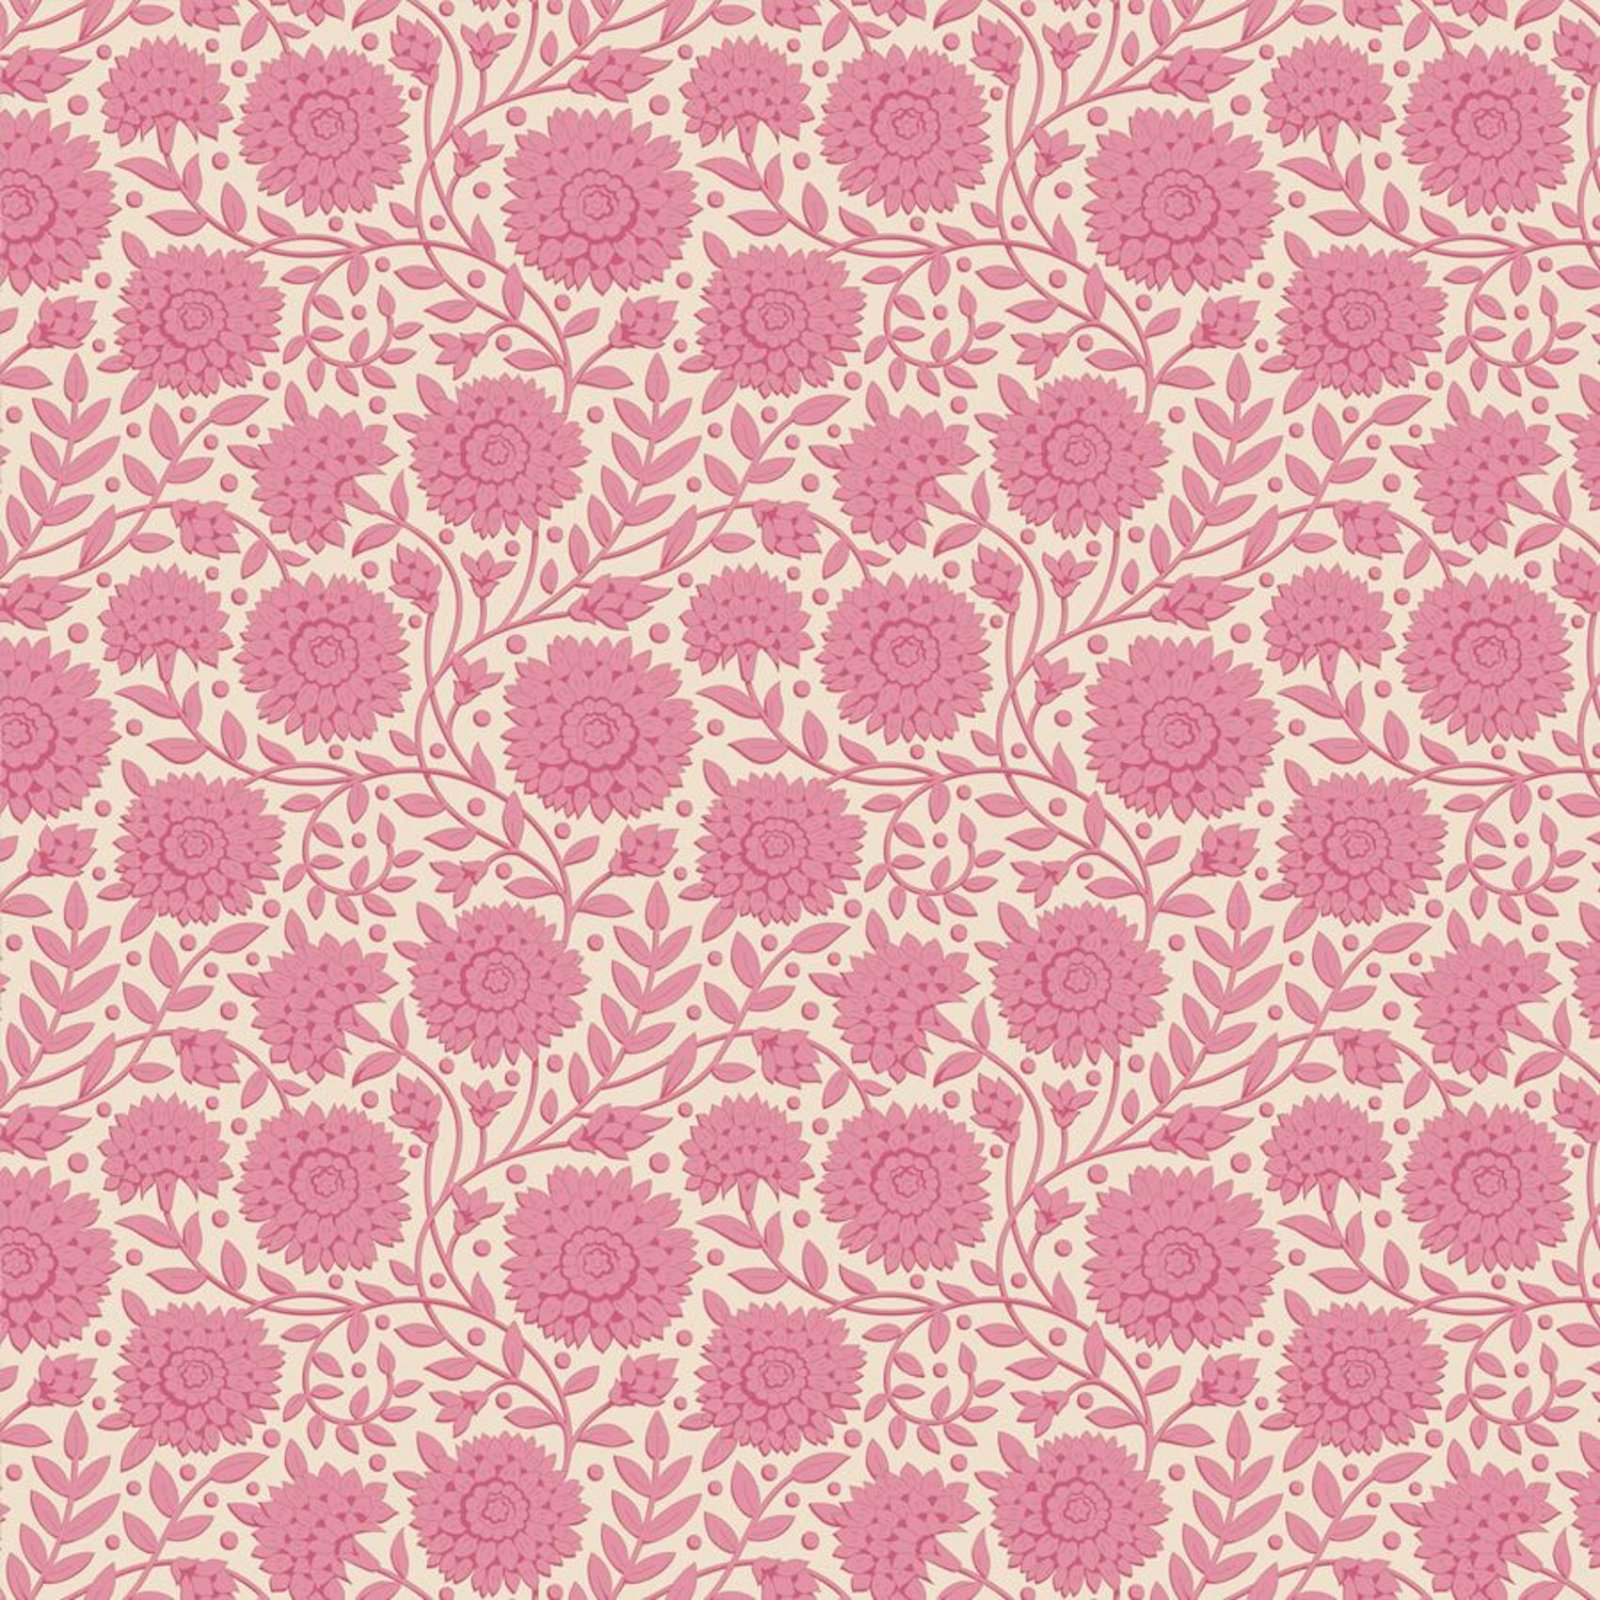 PRE-ORDER  - Tilda - Windy Days - Aella Floral Pink